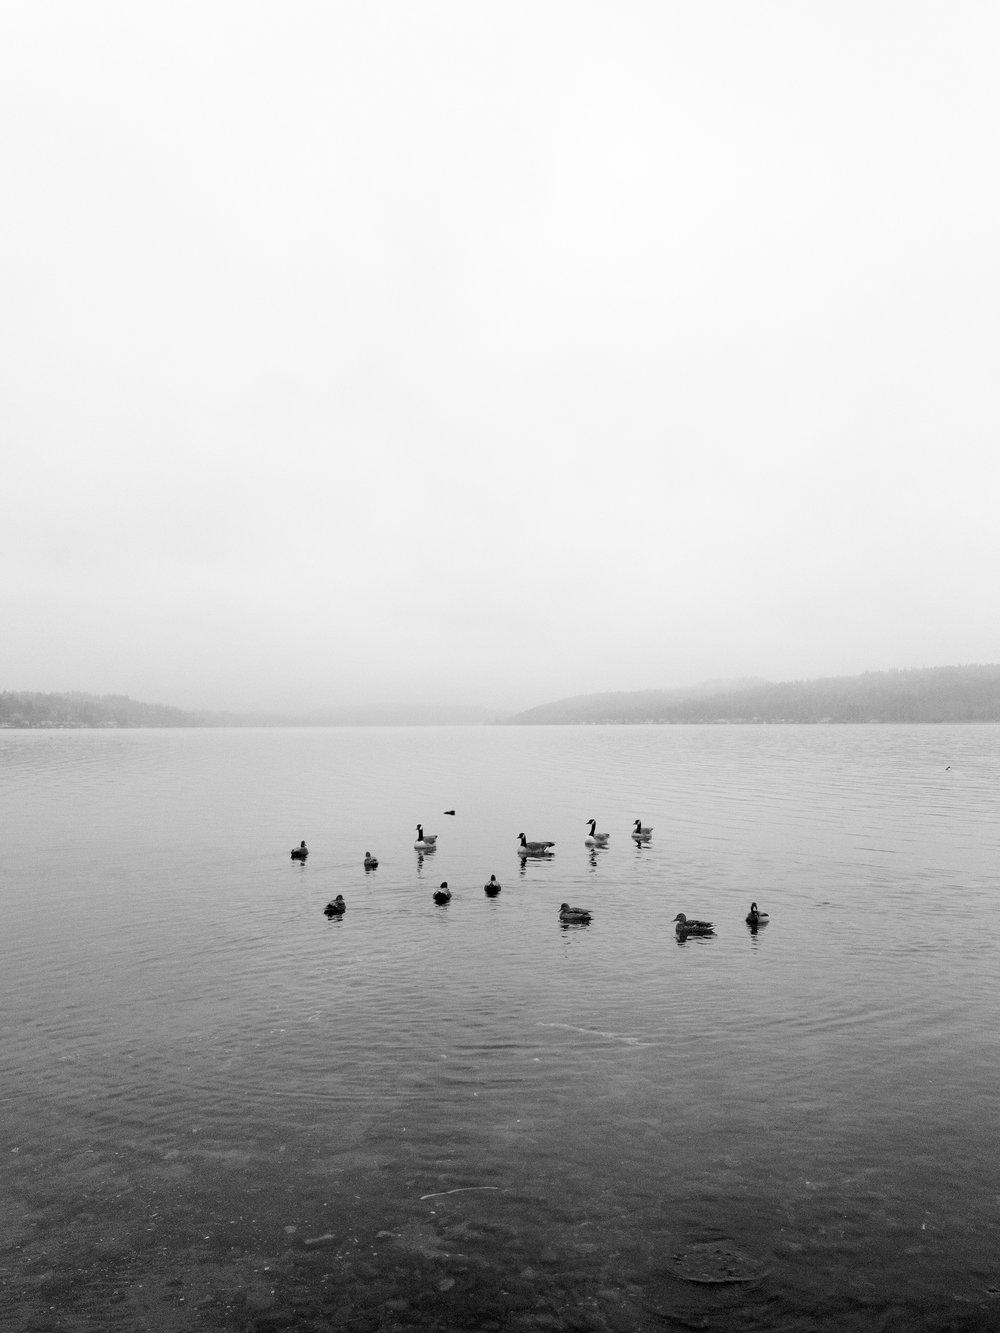 Magnuson Park, Seattle, WA | iPhone 7 Plus